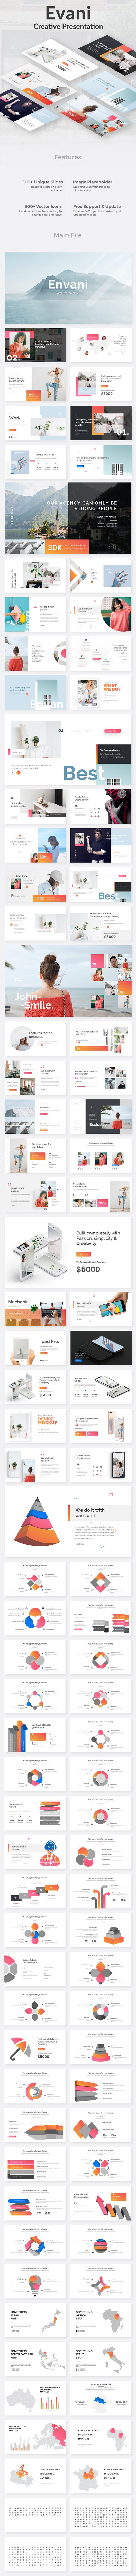 Evani Creative Design Powerpoint Template - Creative PowerPoint Templates